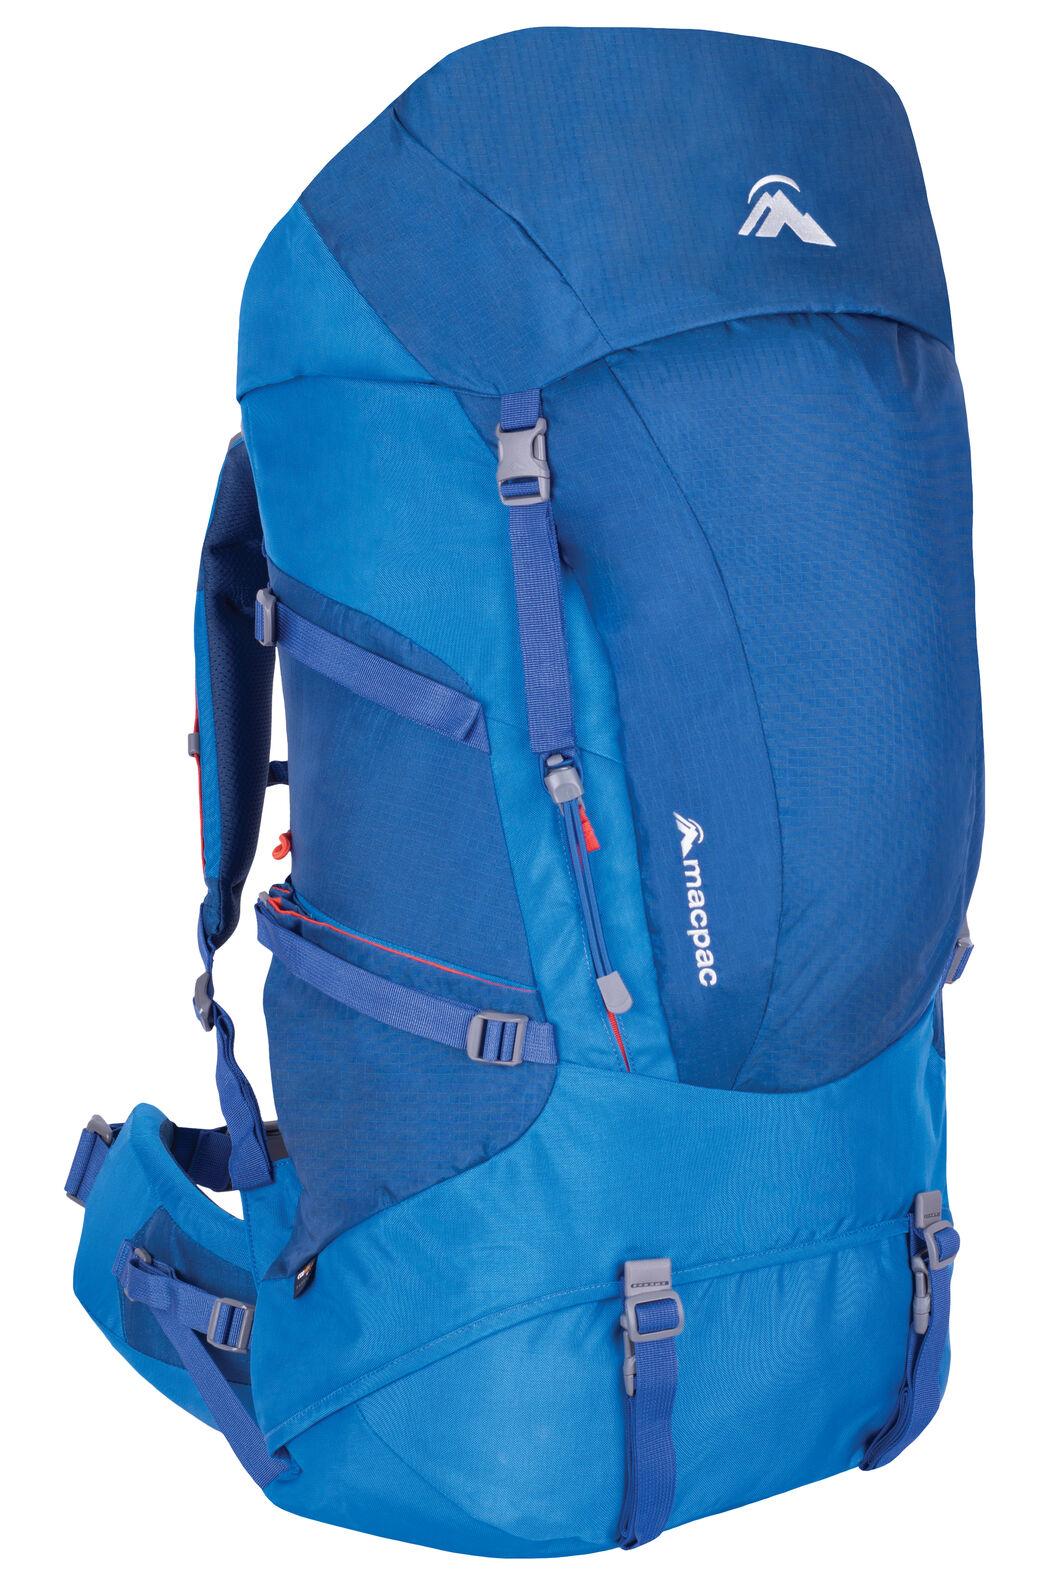 Macpac Torlesse 50L Pack V2, Victoria Blue, hi-res